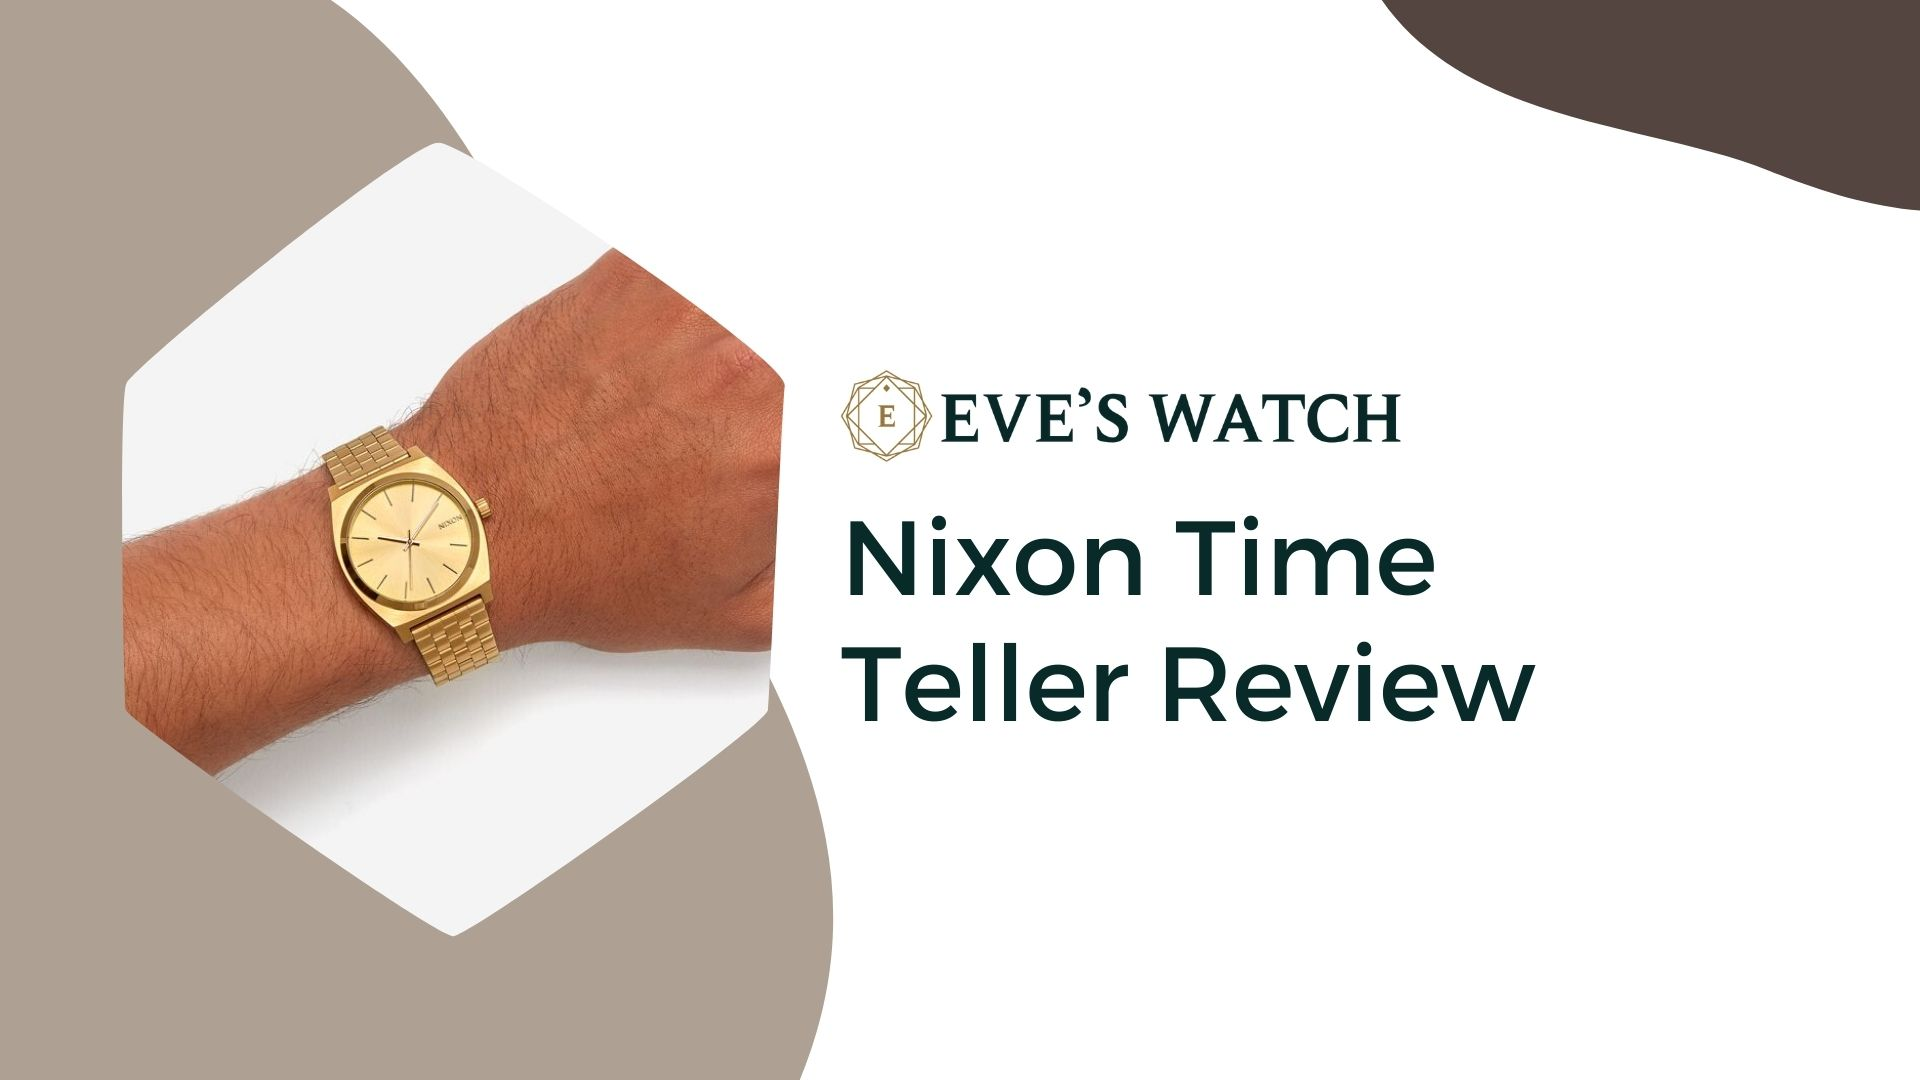 Nixon Time Teller Review